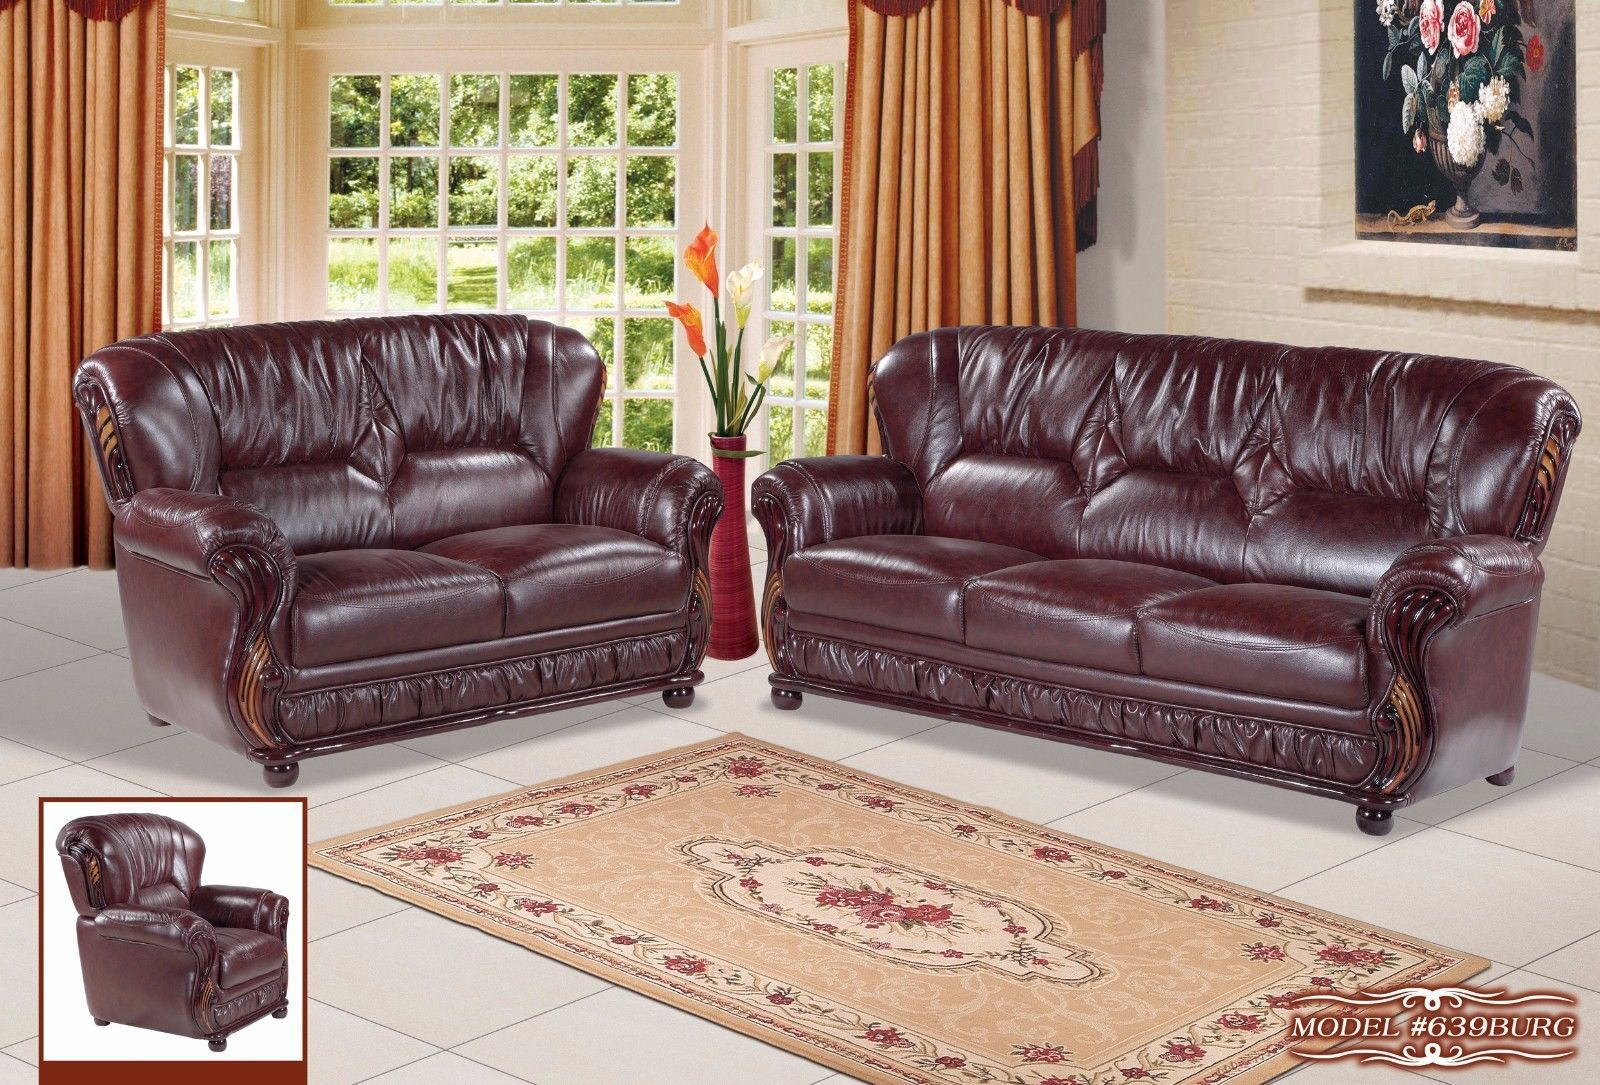 Meridian 639 Mina Living Room Set 3pcs in Burgundy Bonded Leather Traditional